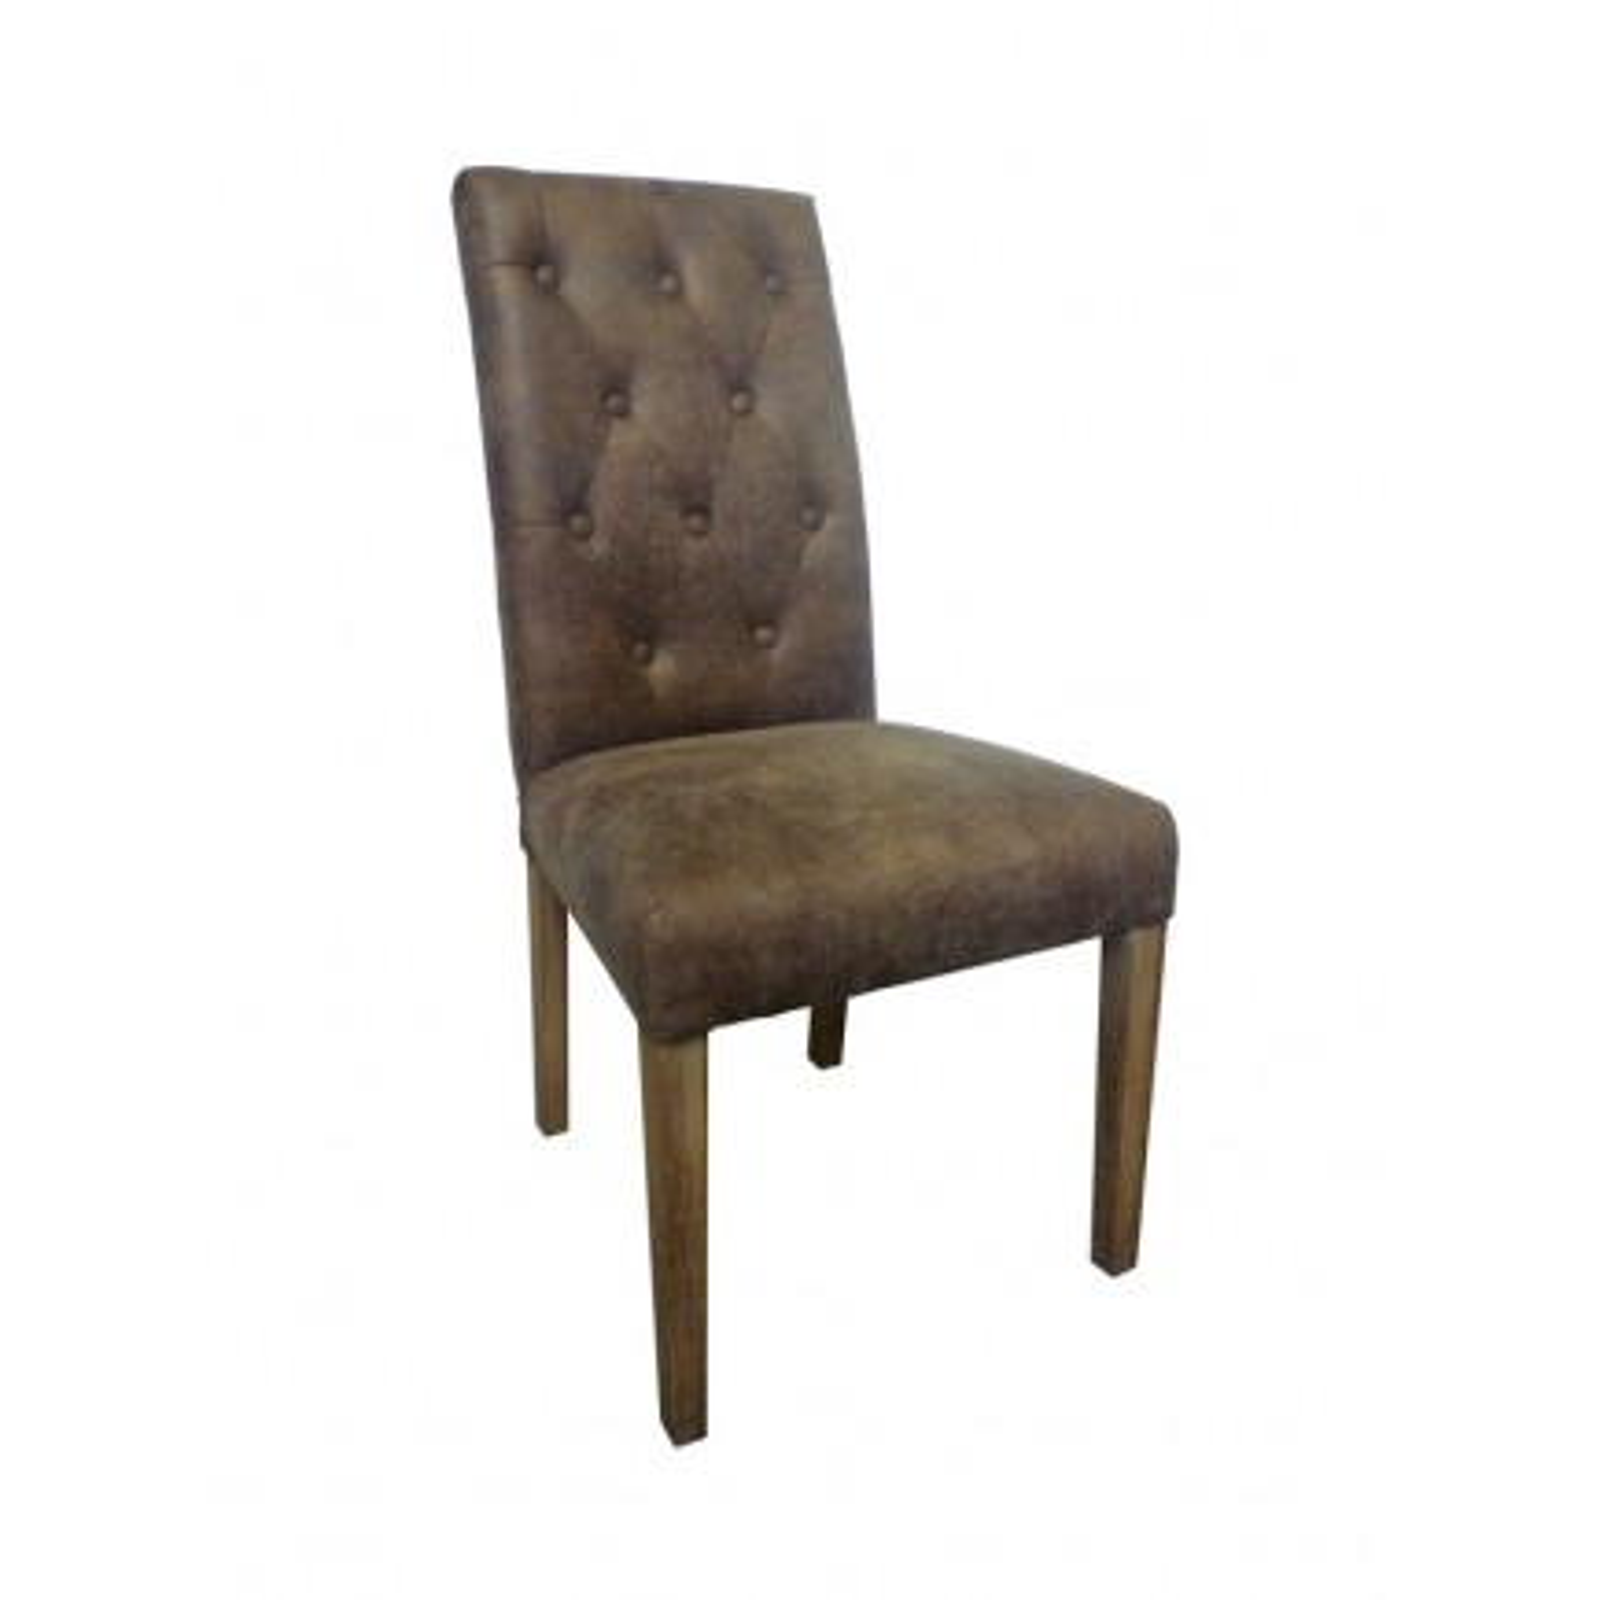 Chaise Chloé Microfibre - chaise design